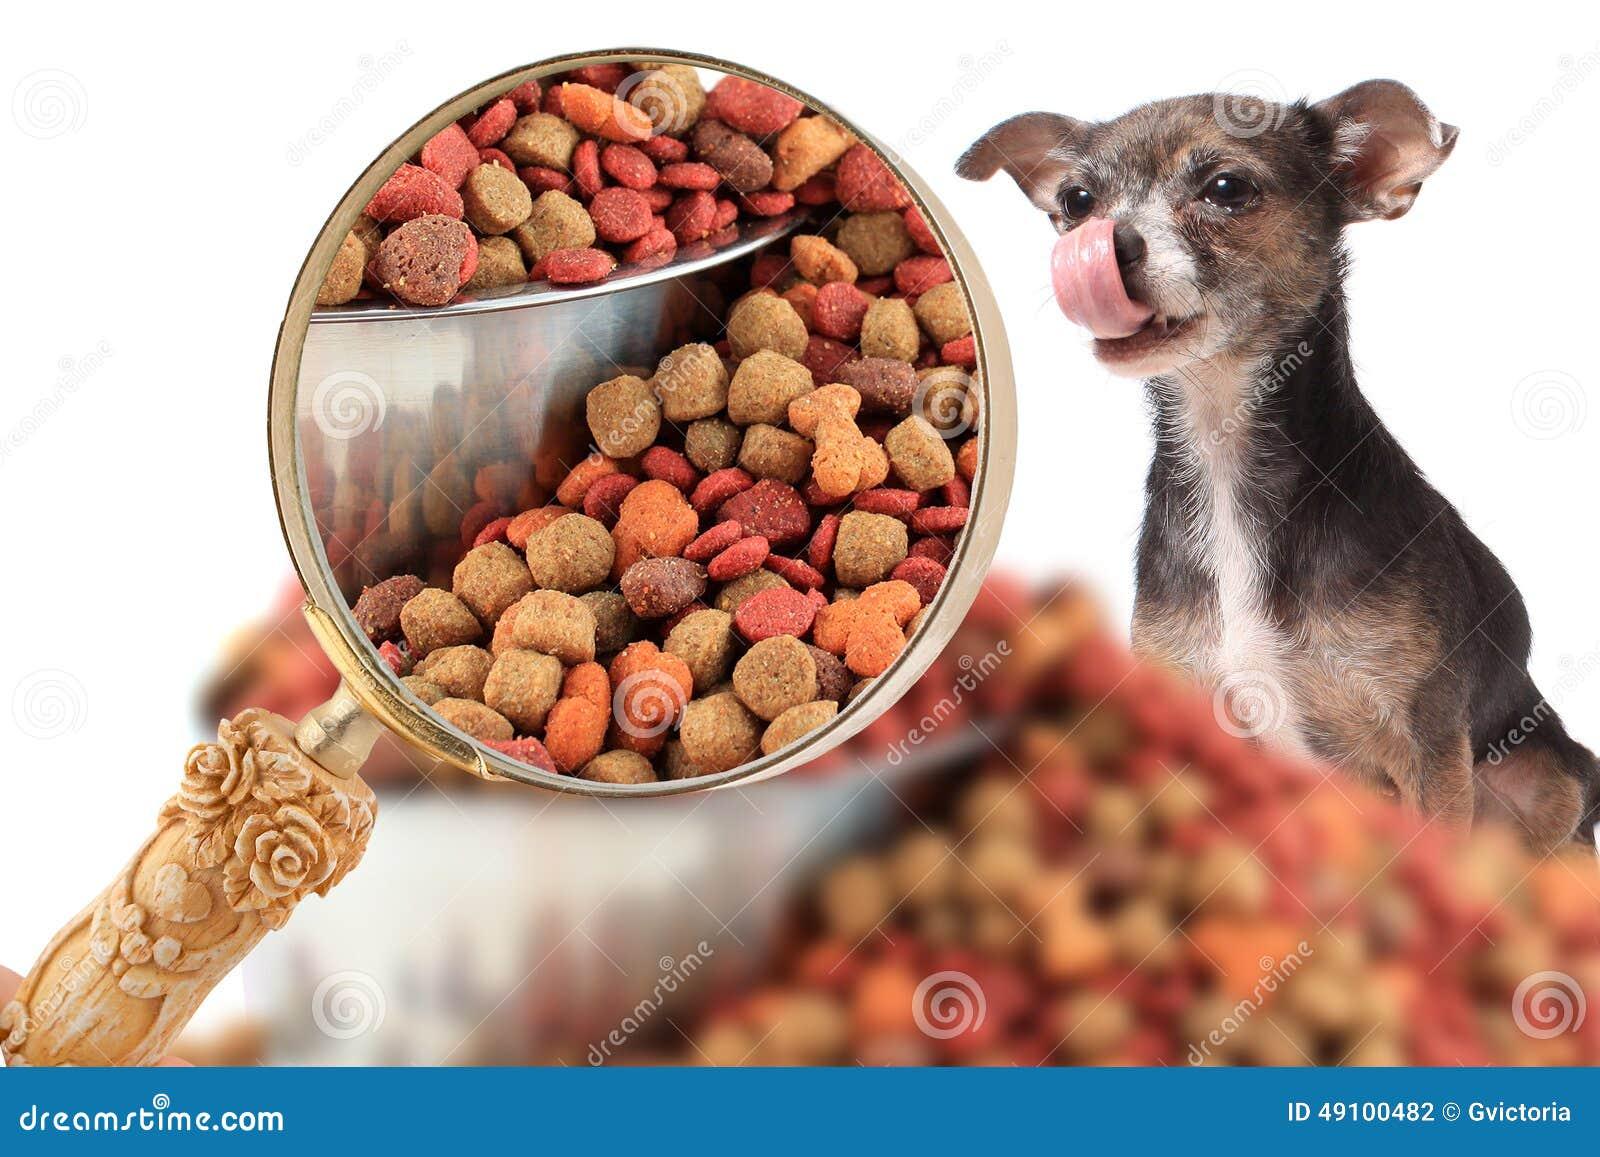 Magnigying dedans sur la nutrition de chien